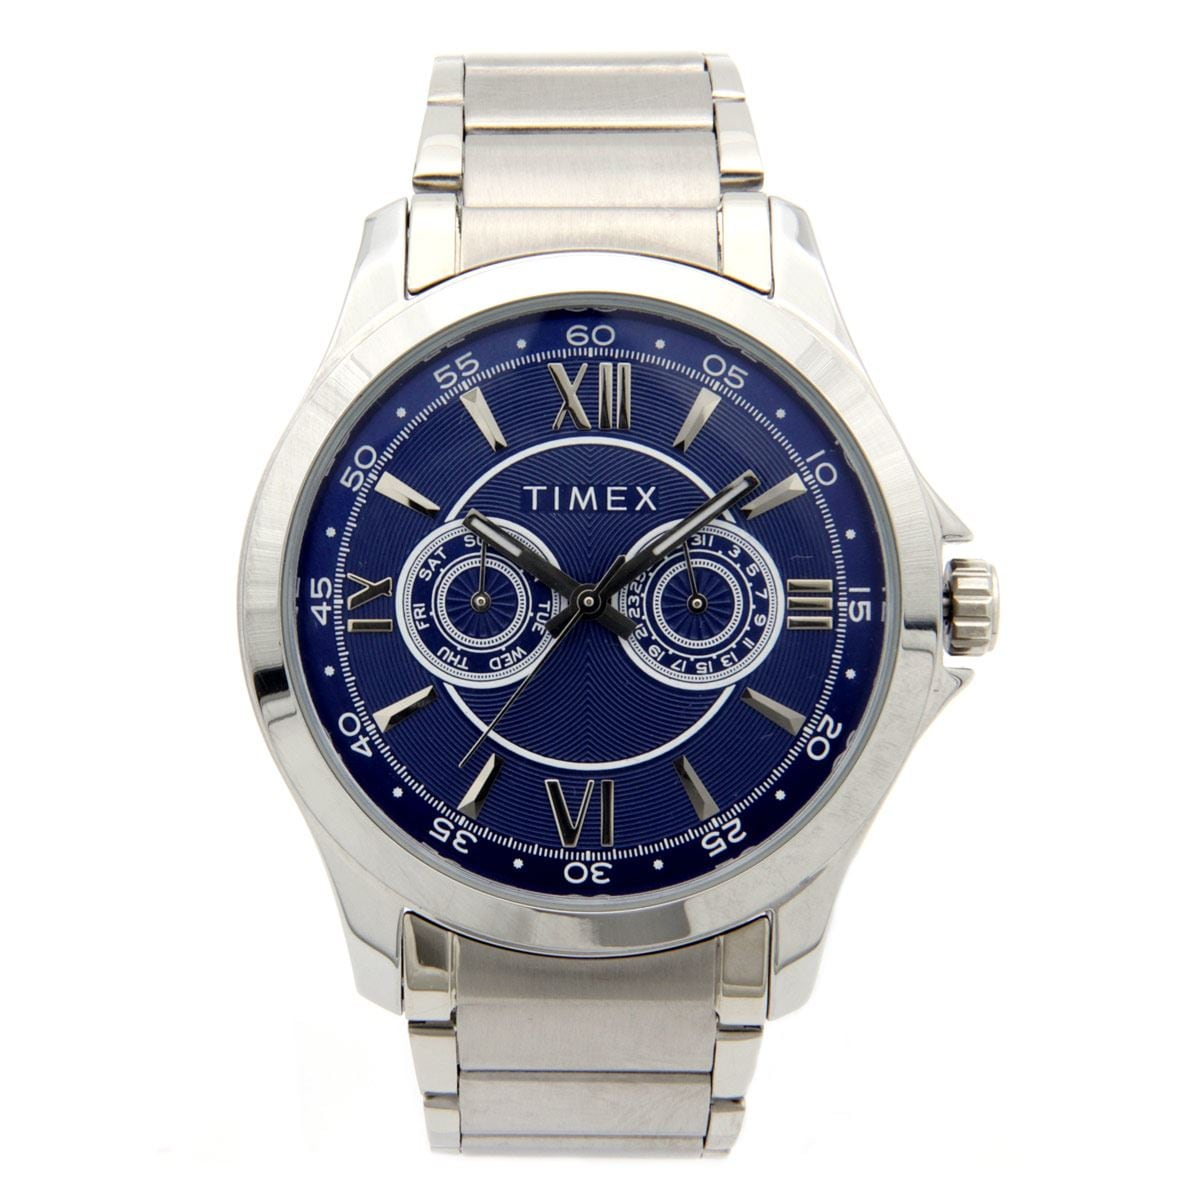 Reloj para Caballero Timex Plateado y Azul